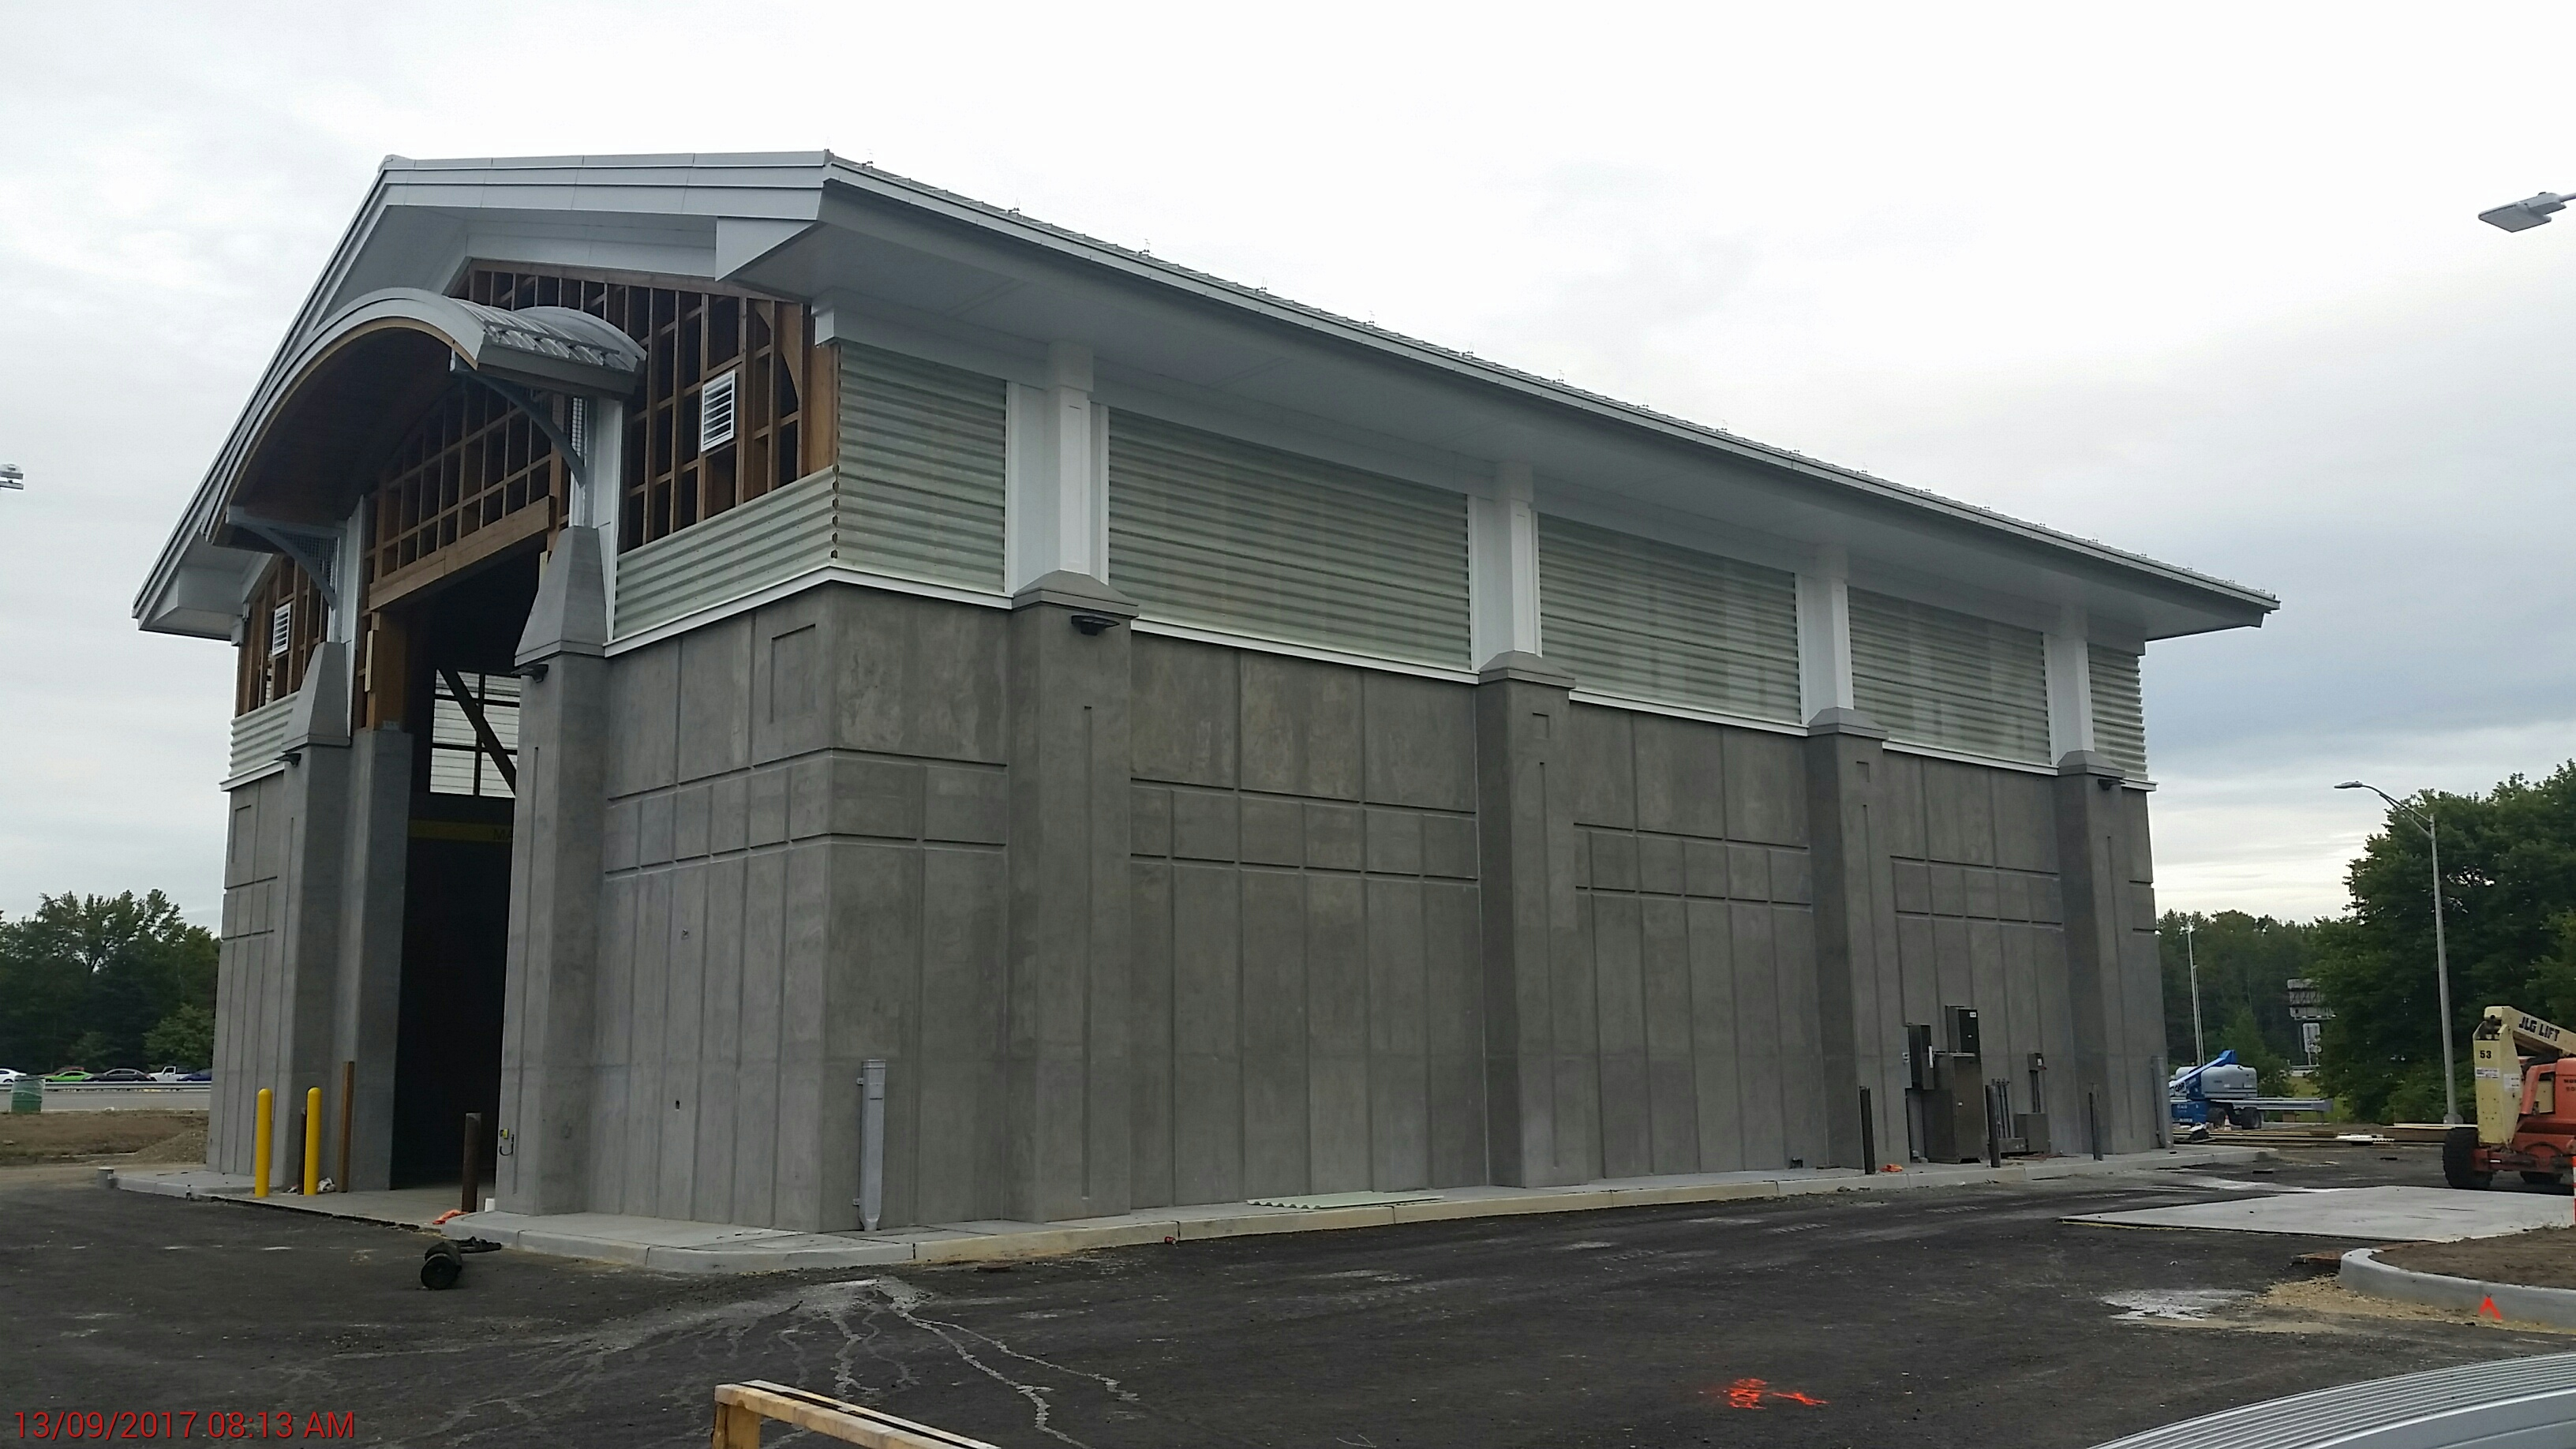 New Jersey Turnpike Authority Facilities Improvement to Interchange 1 Program